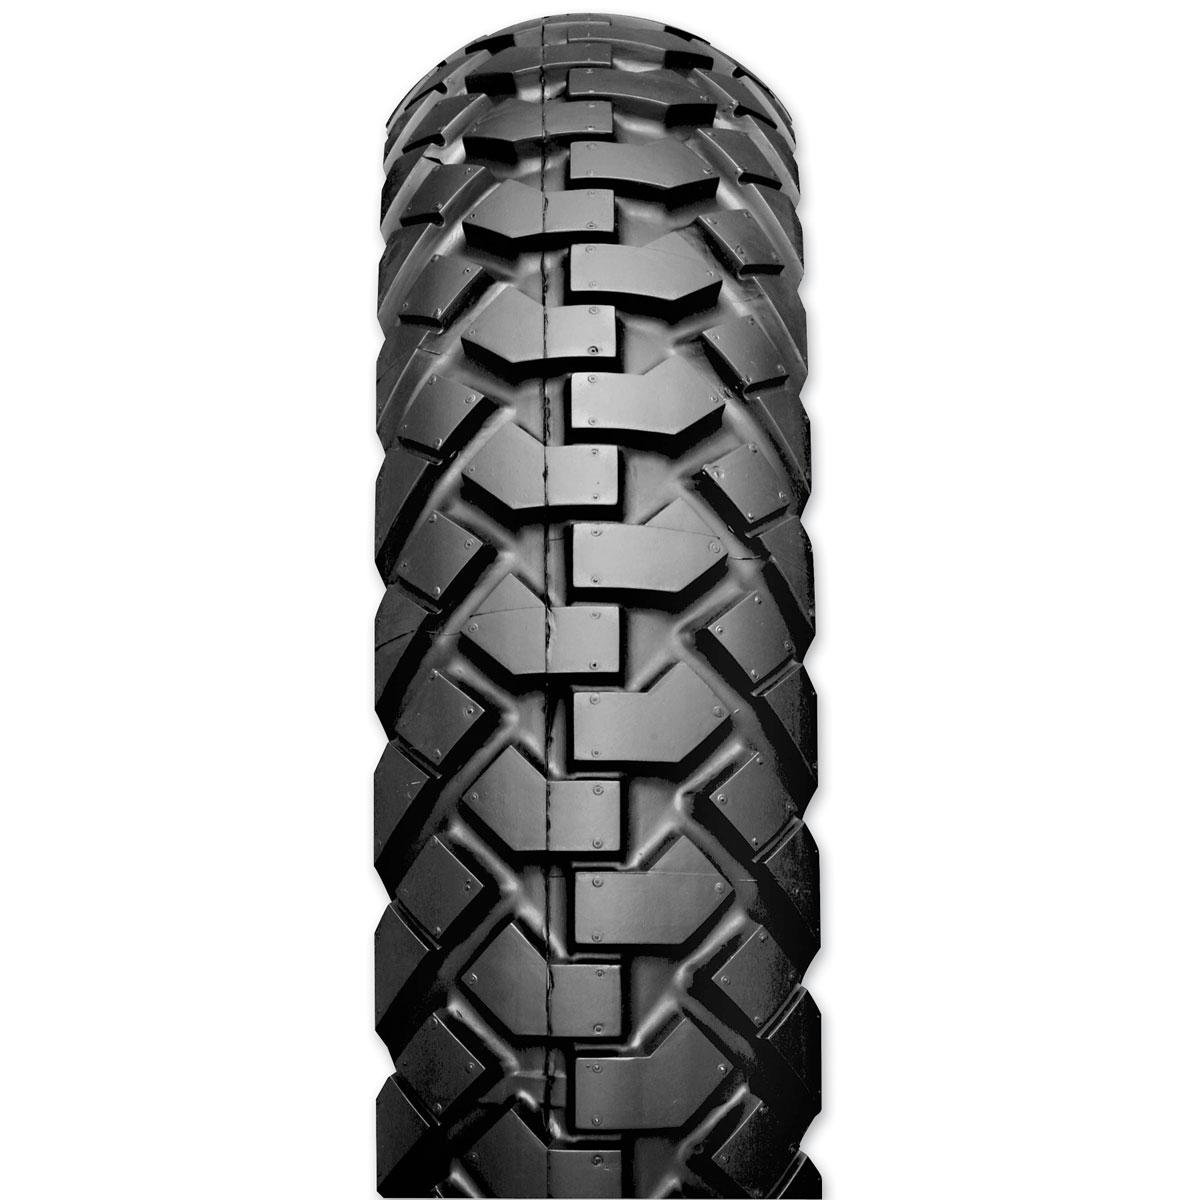 IRC GP110 5.10S17 Rear Tire